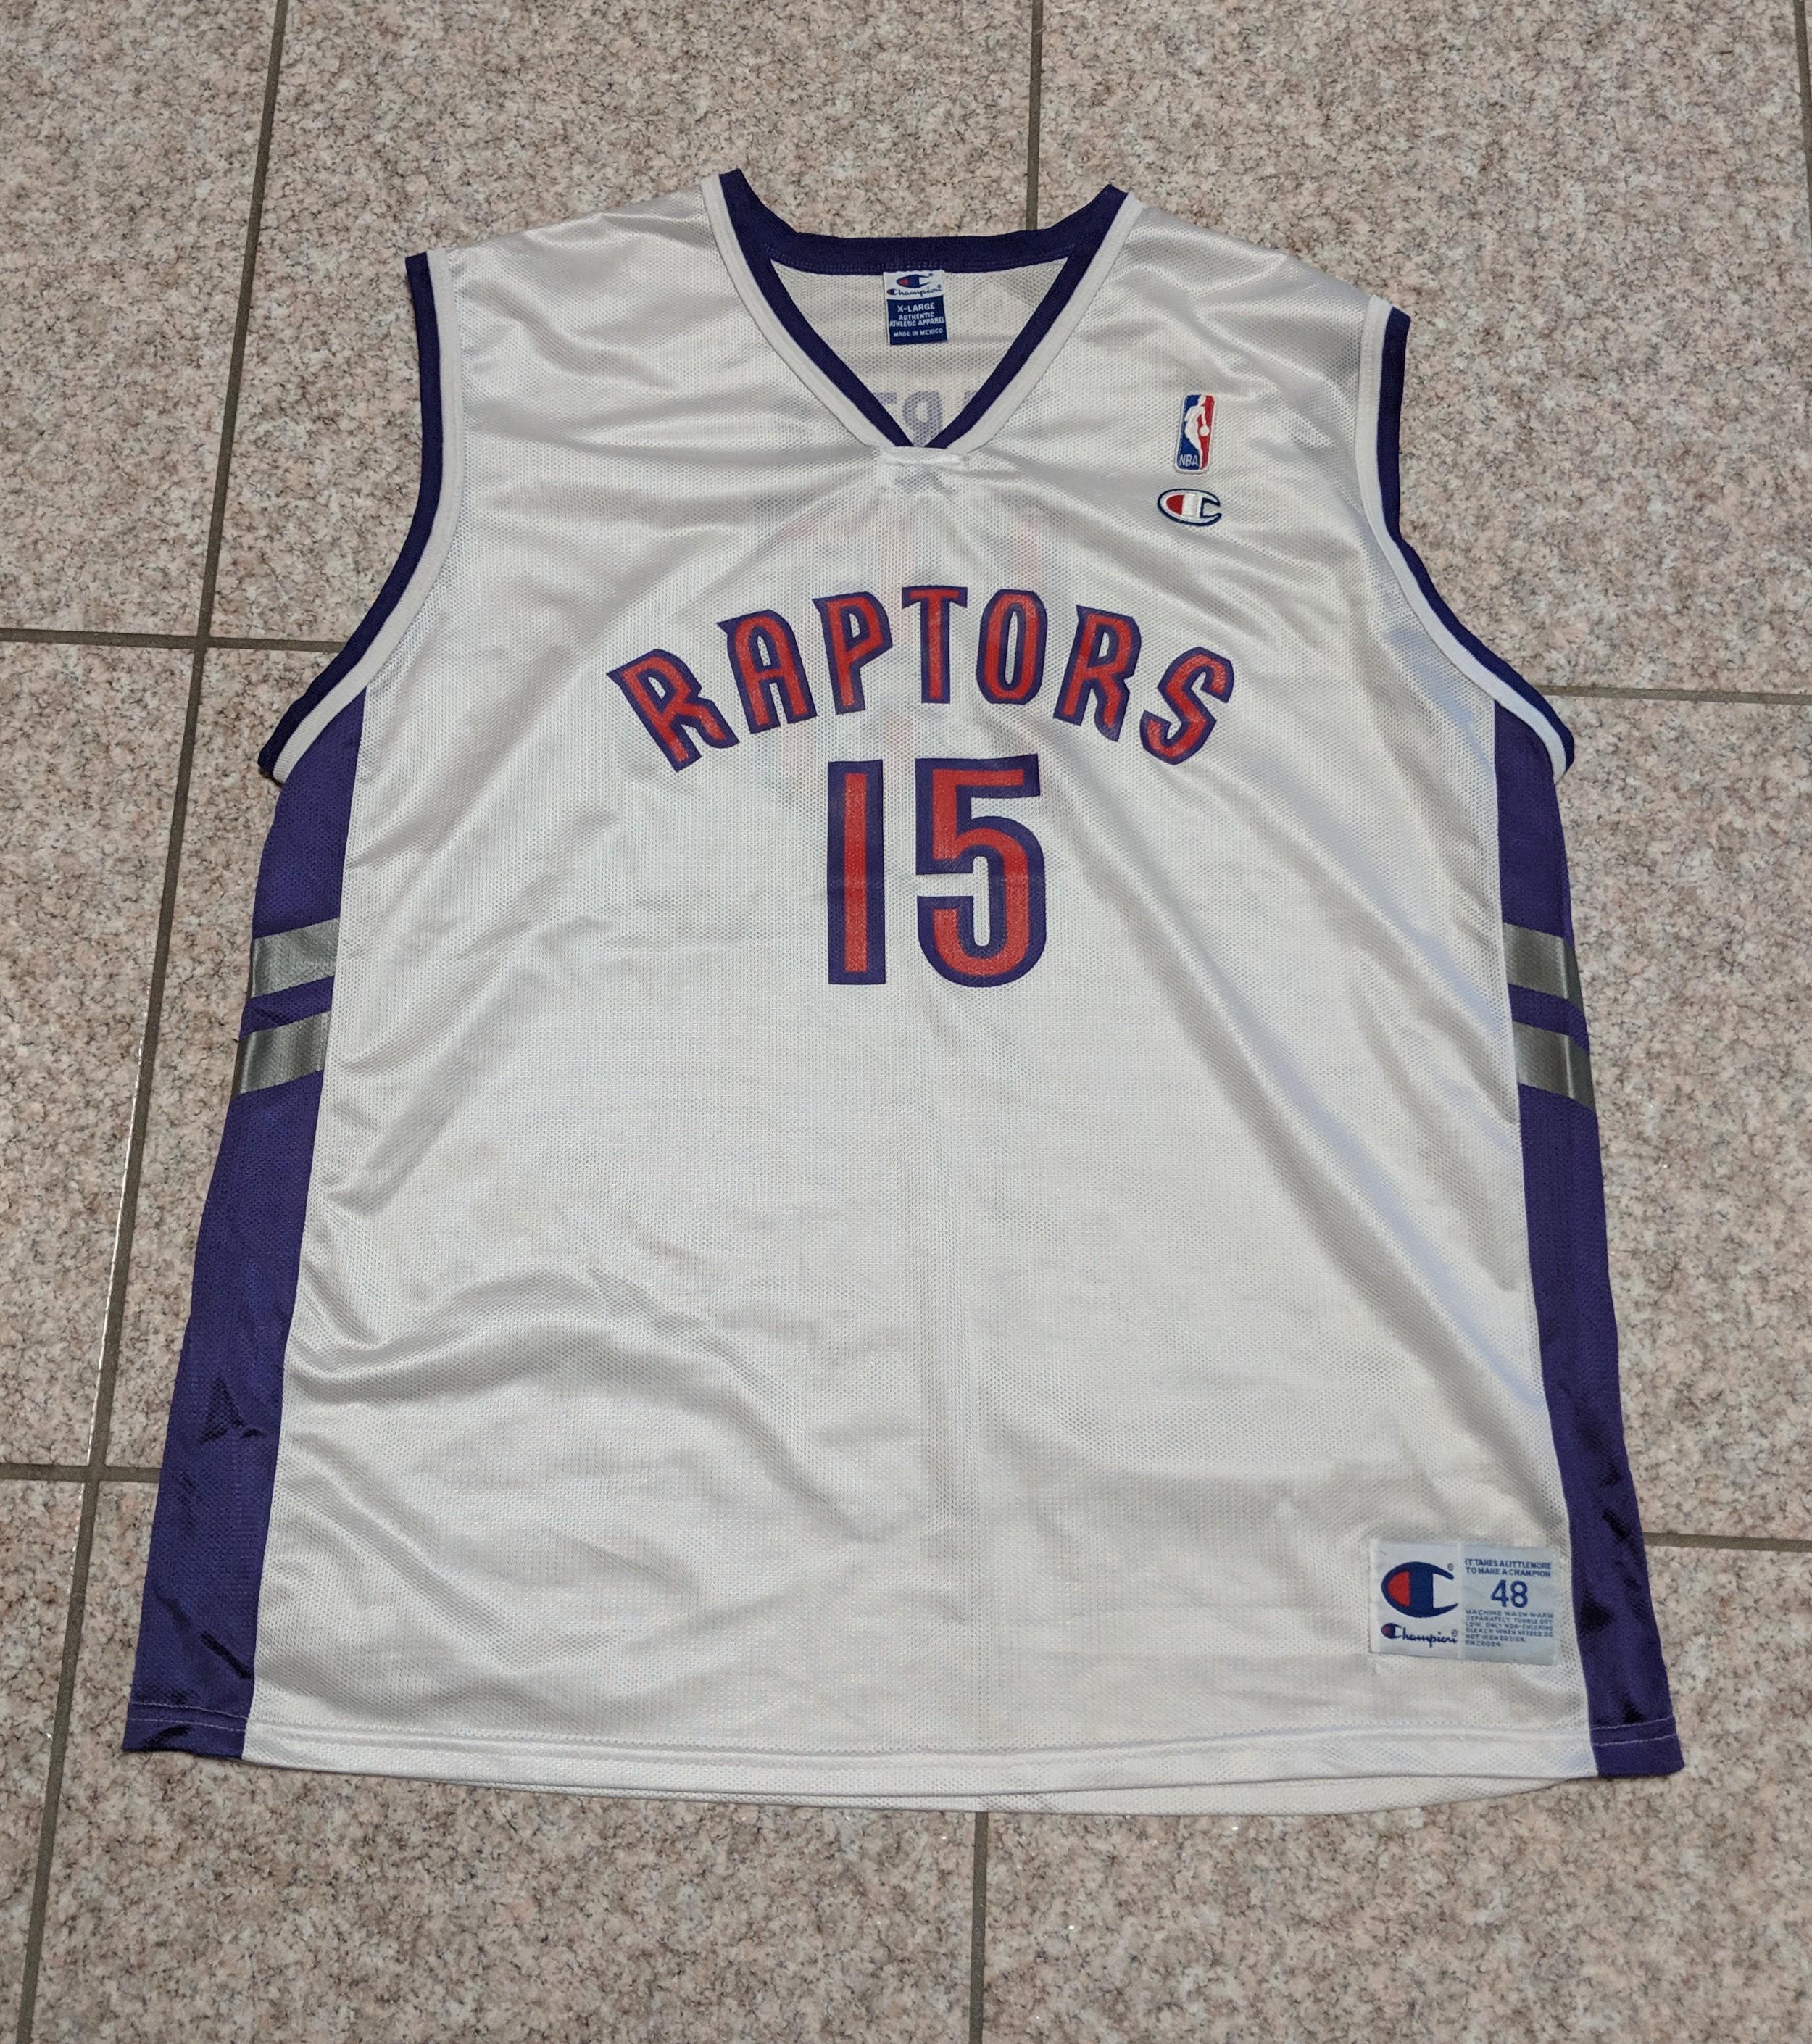 f1fbd3e0 Champion Vintage Champion Vince Carter Toronto Raptors Jersey | Grailed